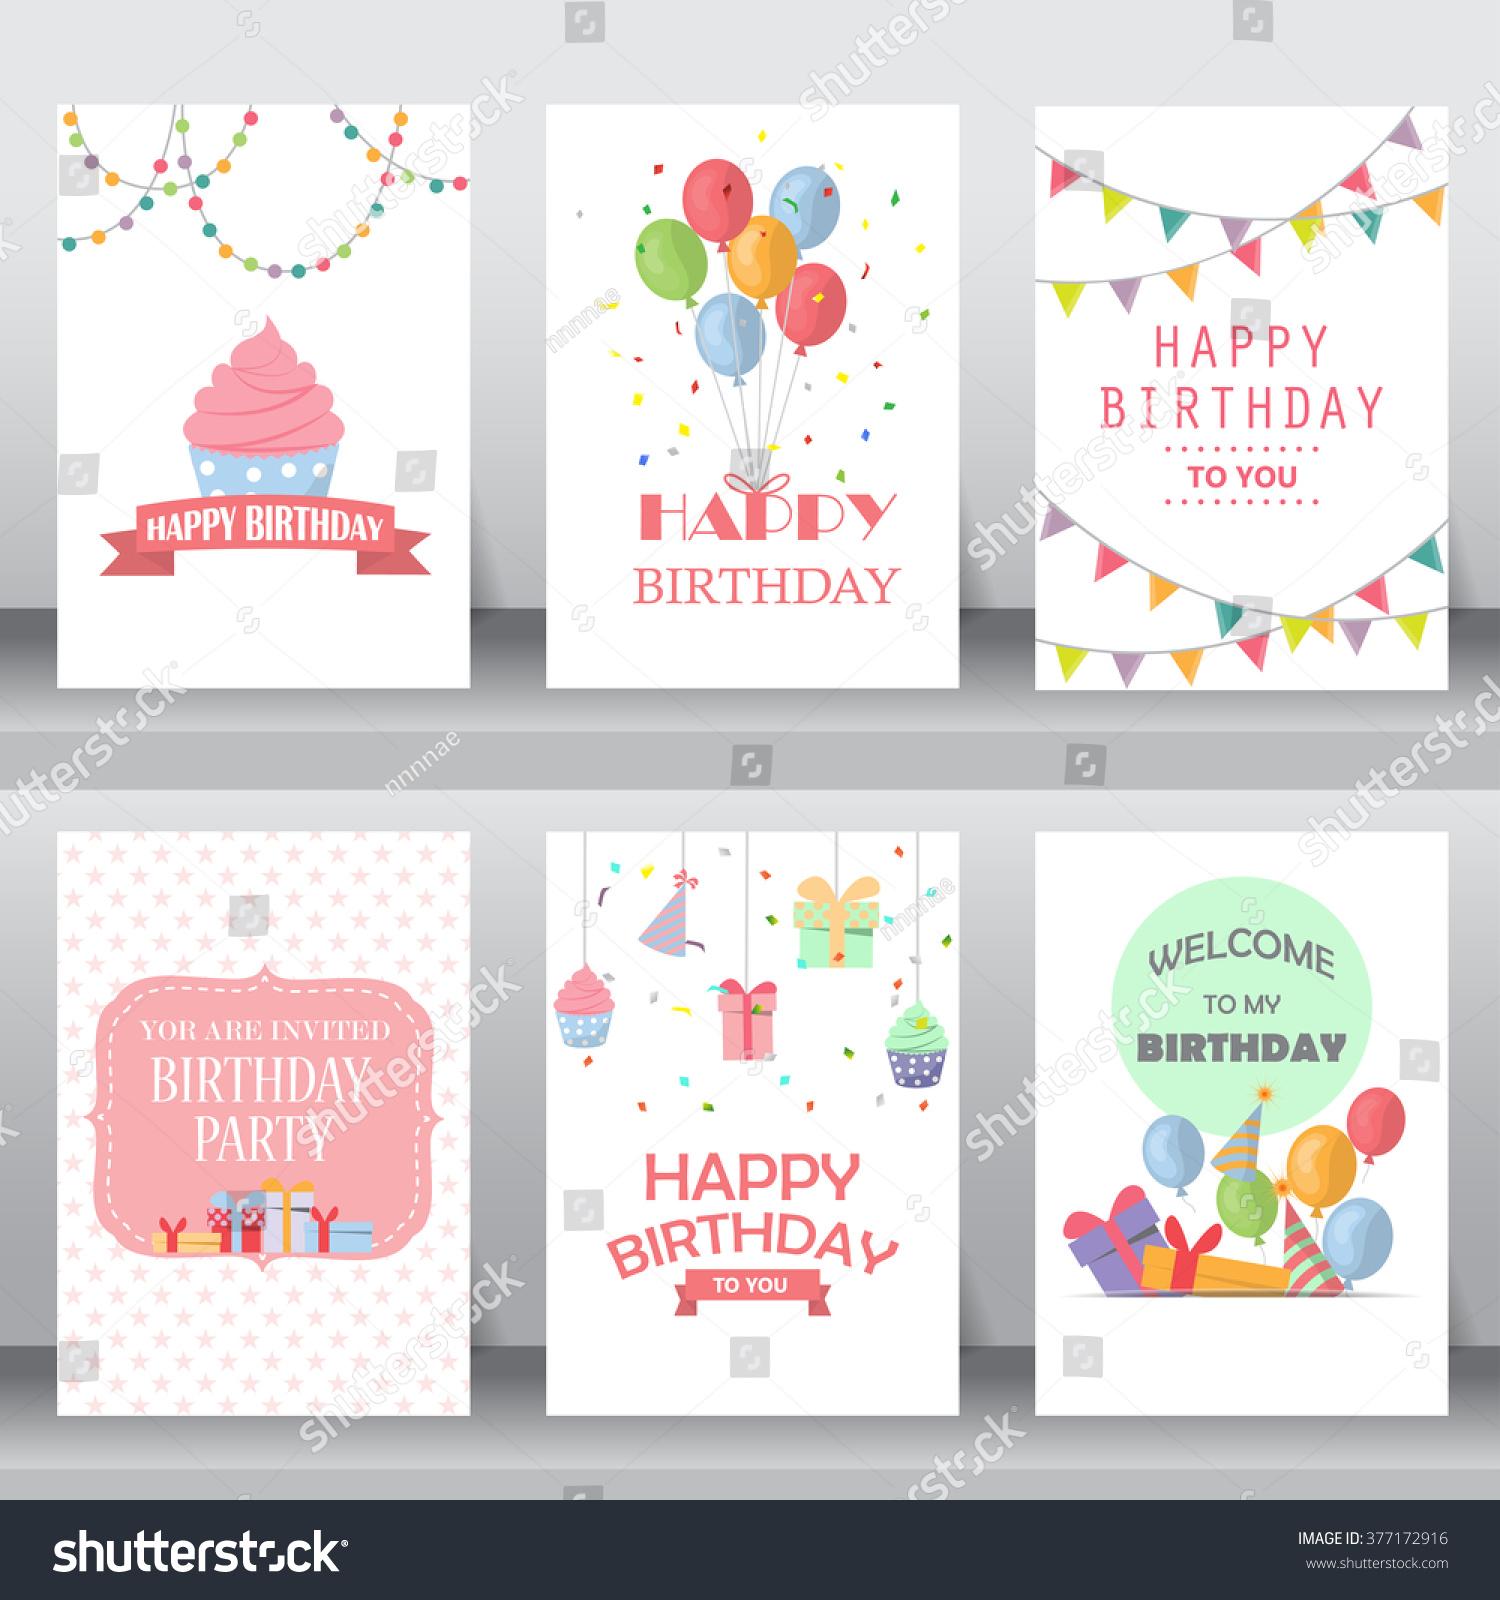 birthday holiday christmas greeting invitation card のベクター画像